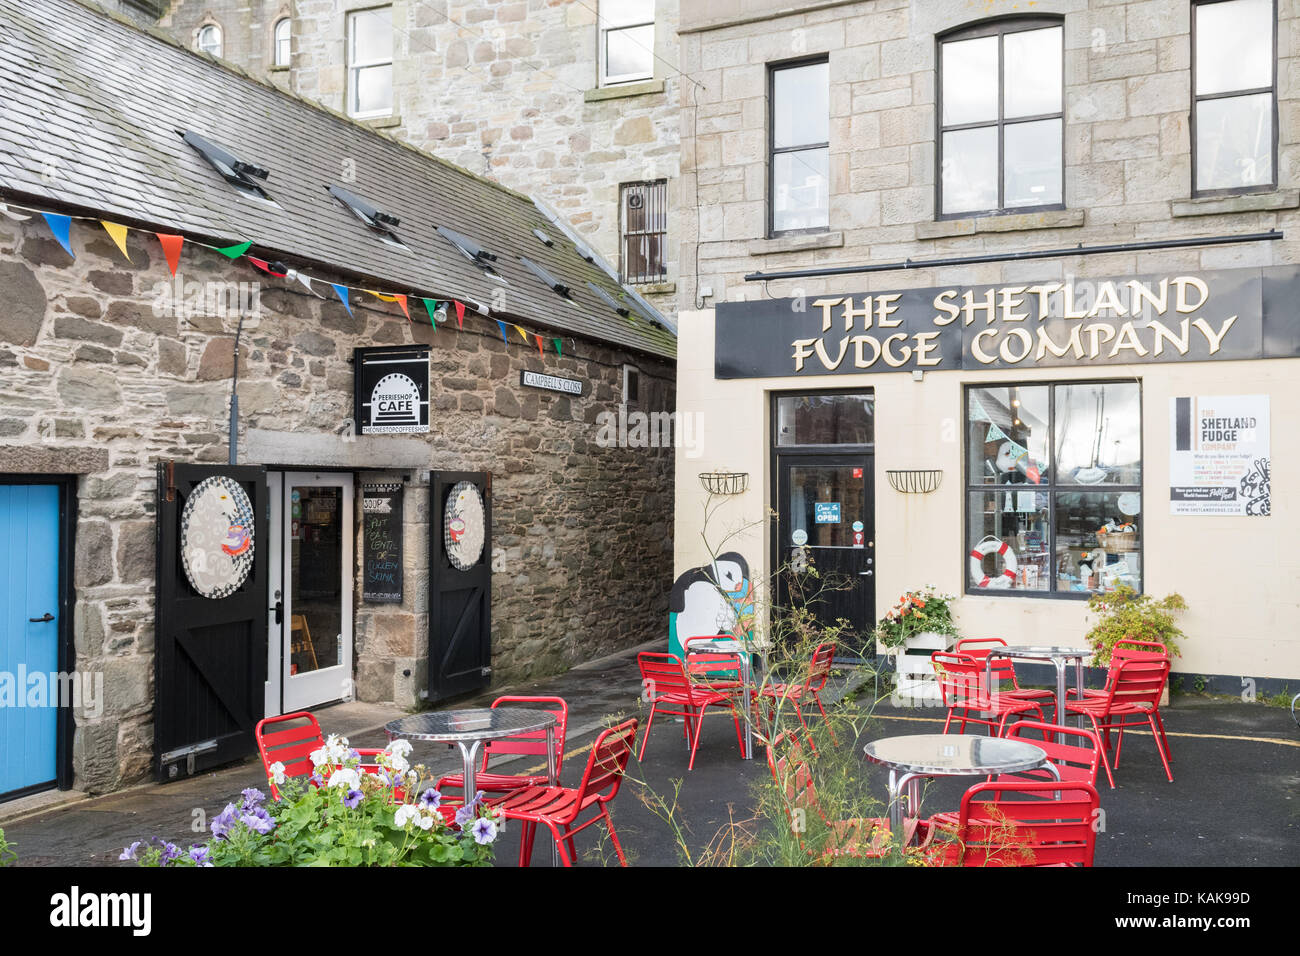 Peerieshop cafe and The Shetland Fudge Company, Lerwick, Shetland Islands, Scotland, UK - Stock Image